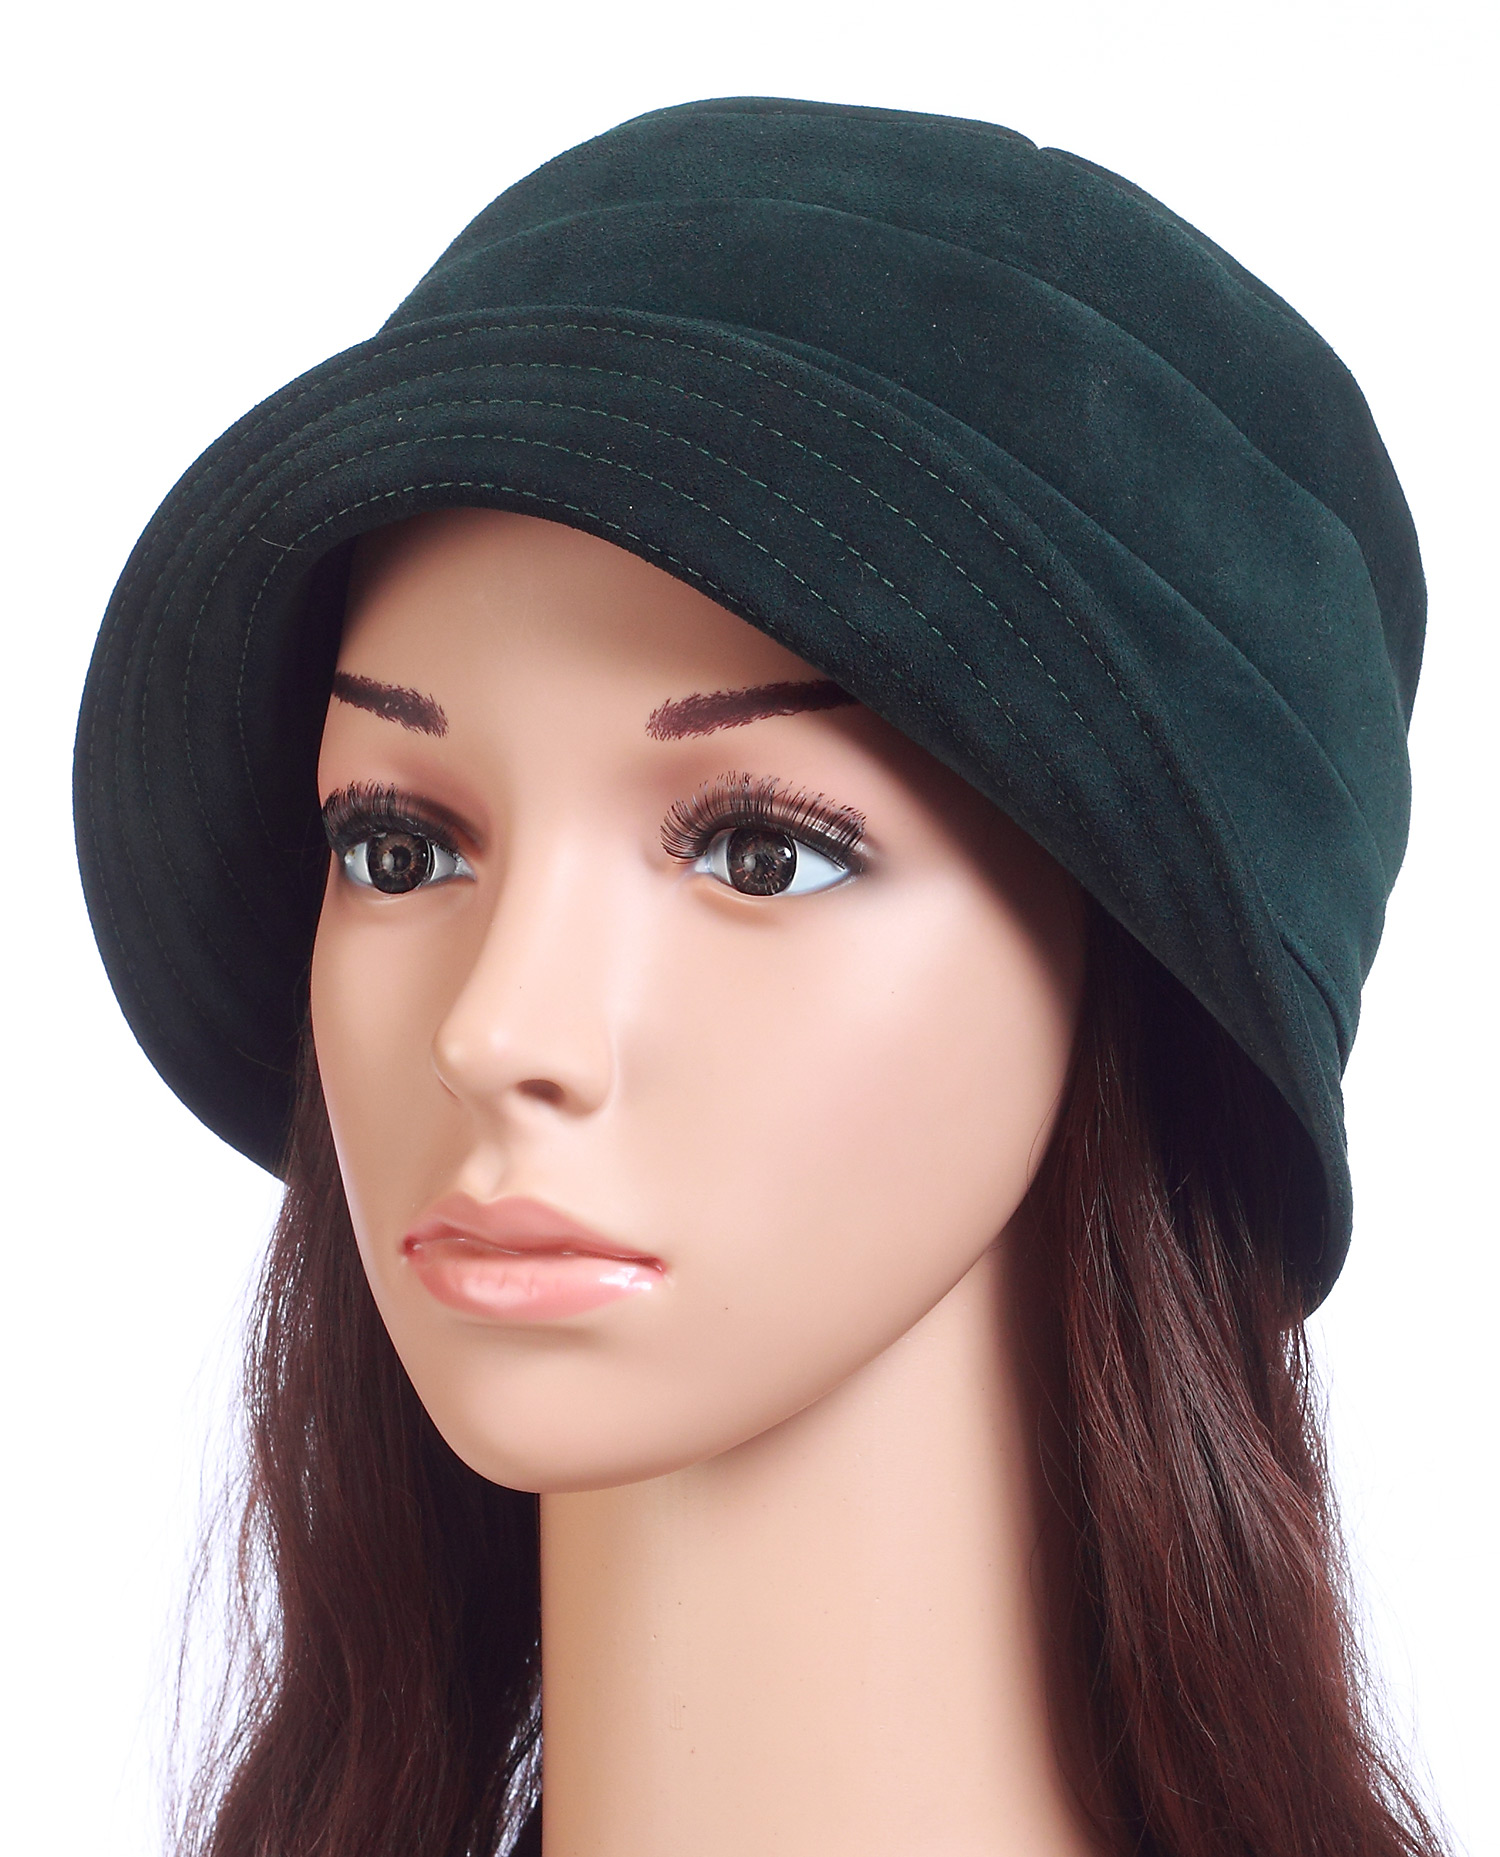 Шапка женская из замши<br><br>Материал: Замша<br>Цвет: Зеленый<br>Пол: Женский